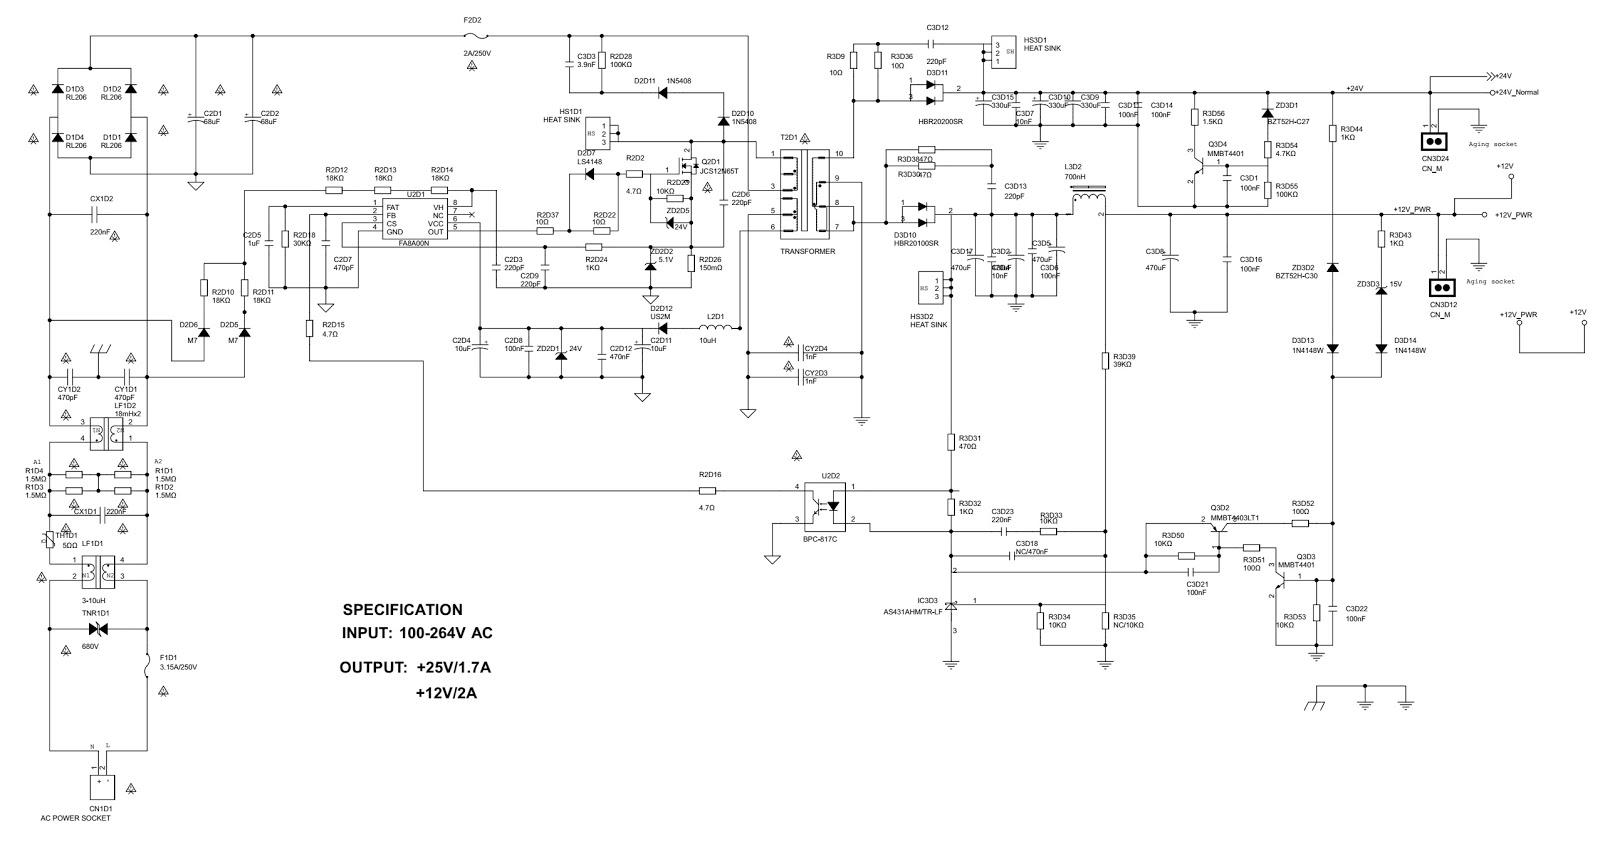 philco ph39e31 39 inch led lcd tv power board circuit diagram schematic  [ 1600 x 847 Pixel ]